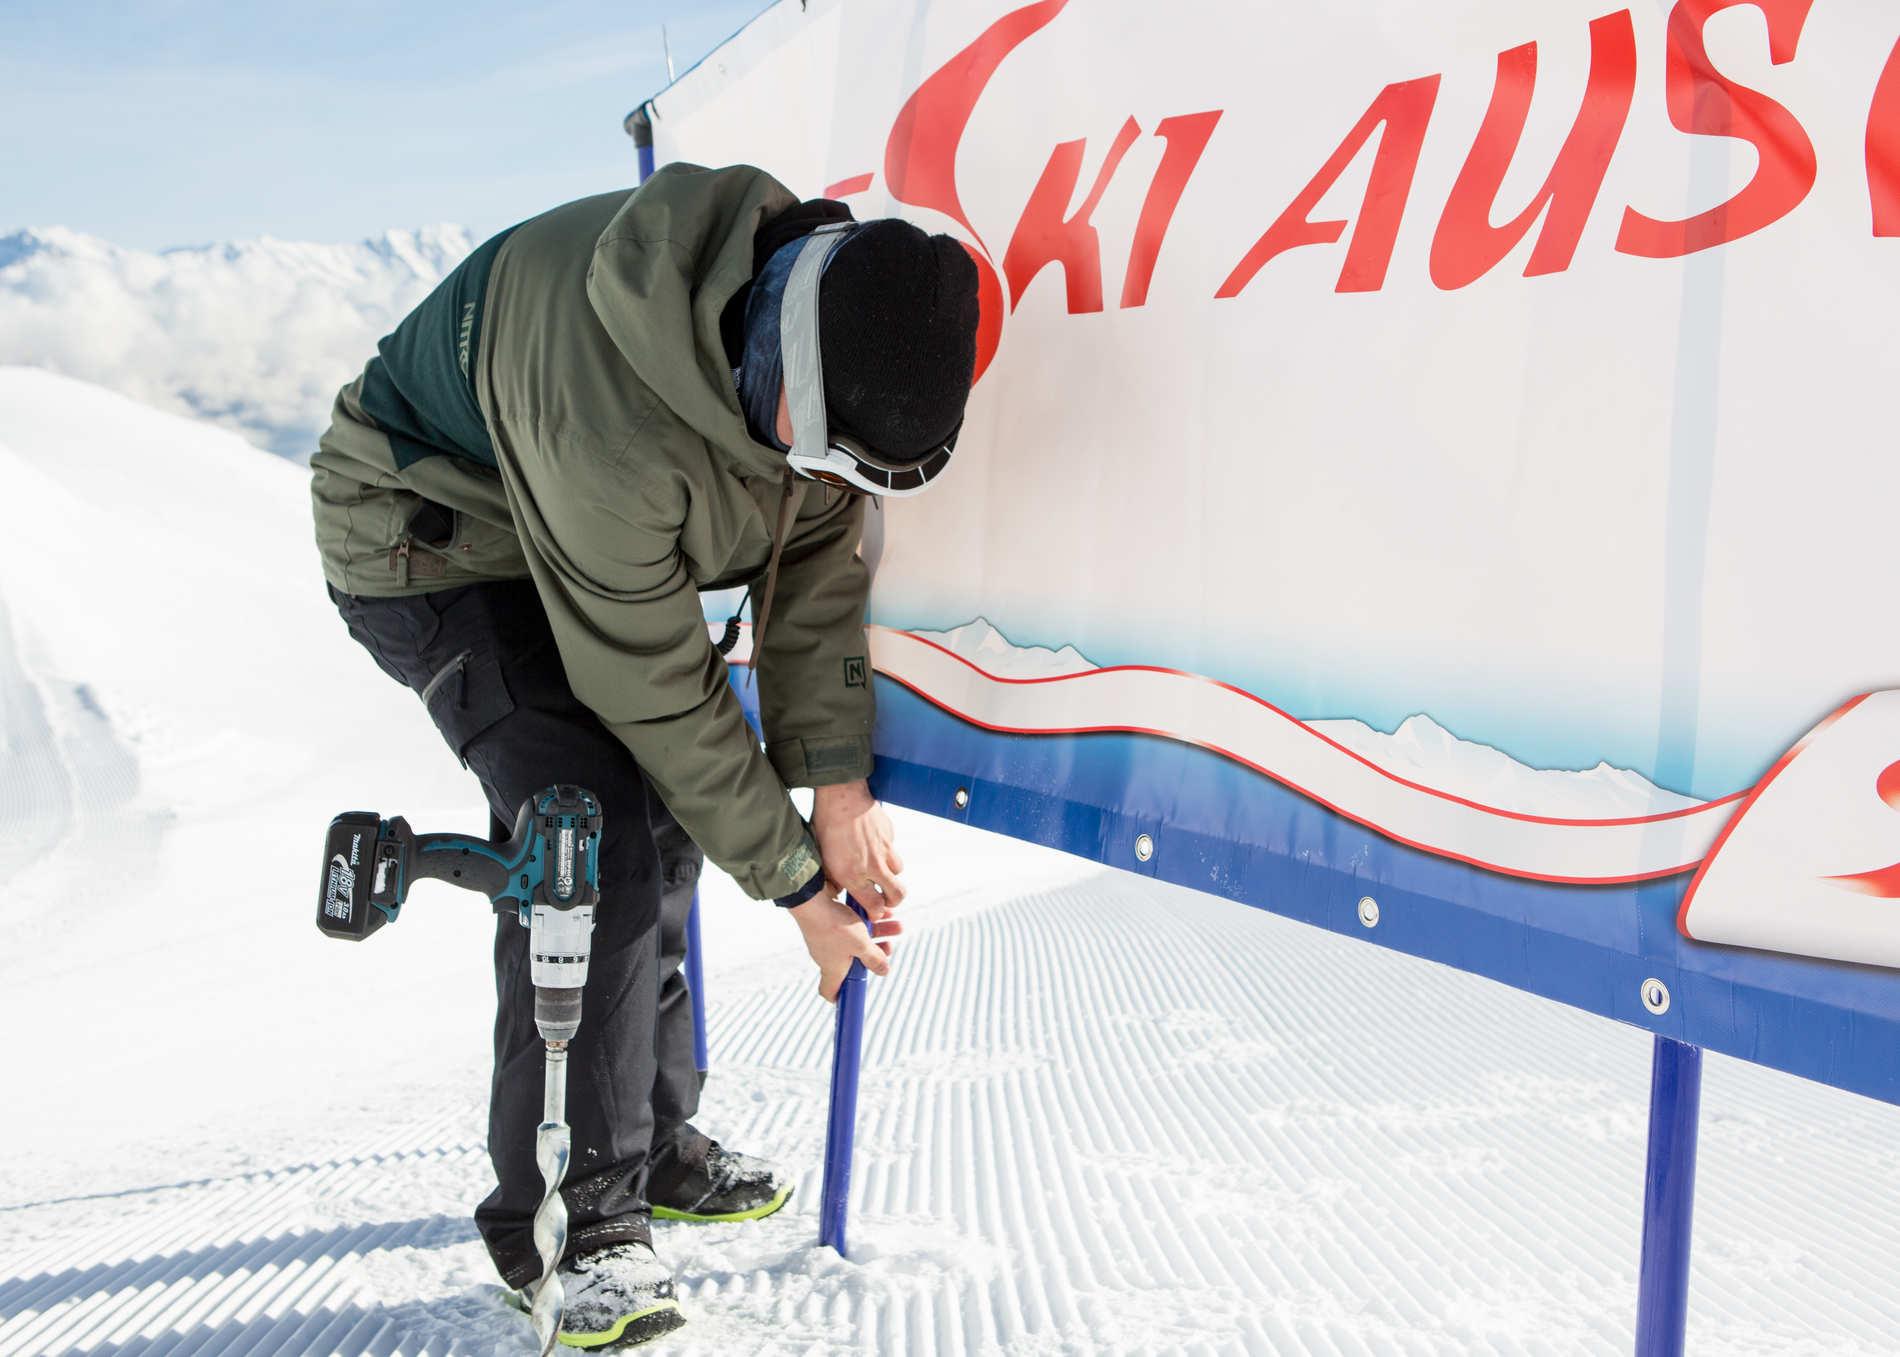 Interessante Praktikumsausschreibung - SkiingMag